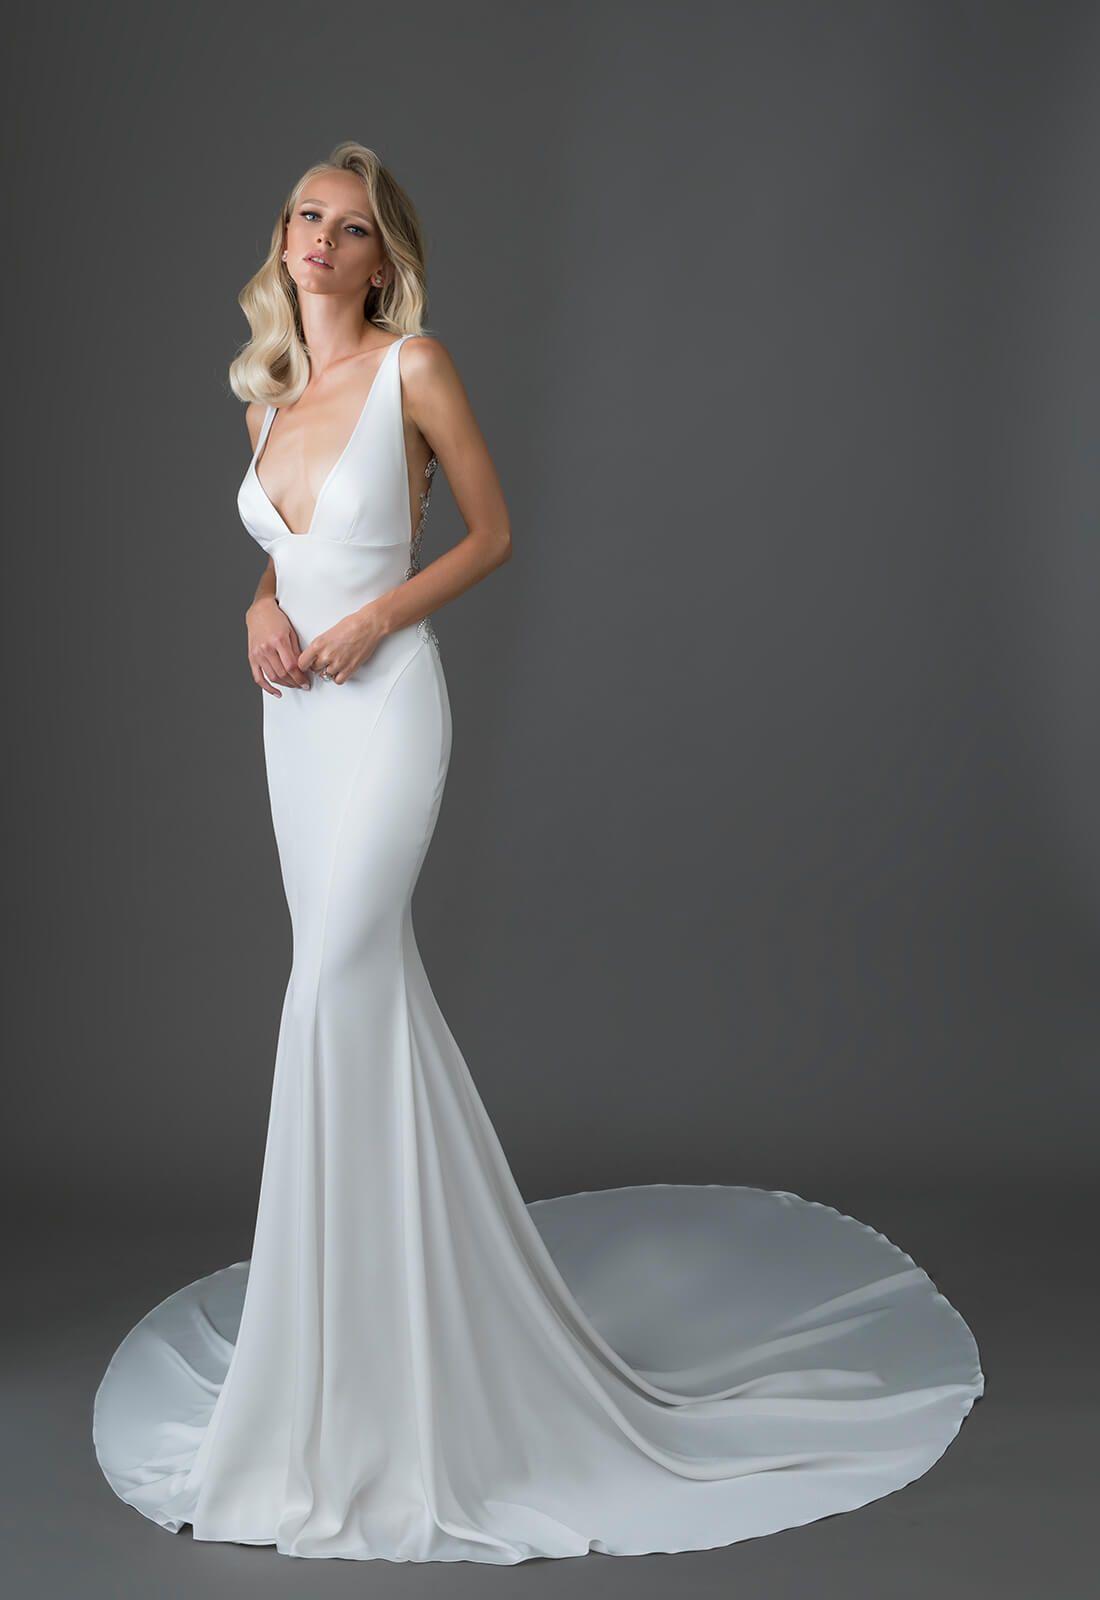 V Neck Crepe Sheath Wedding Dress With Crystal Embellishments Pnina Tornai Pnina Tornai Wedding Dress Wedding Dresses Kleinfeld Wedding Dress Preservation